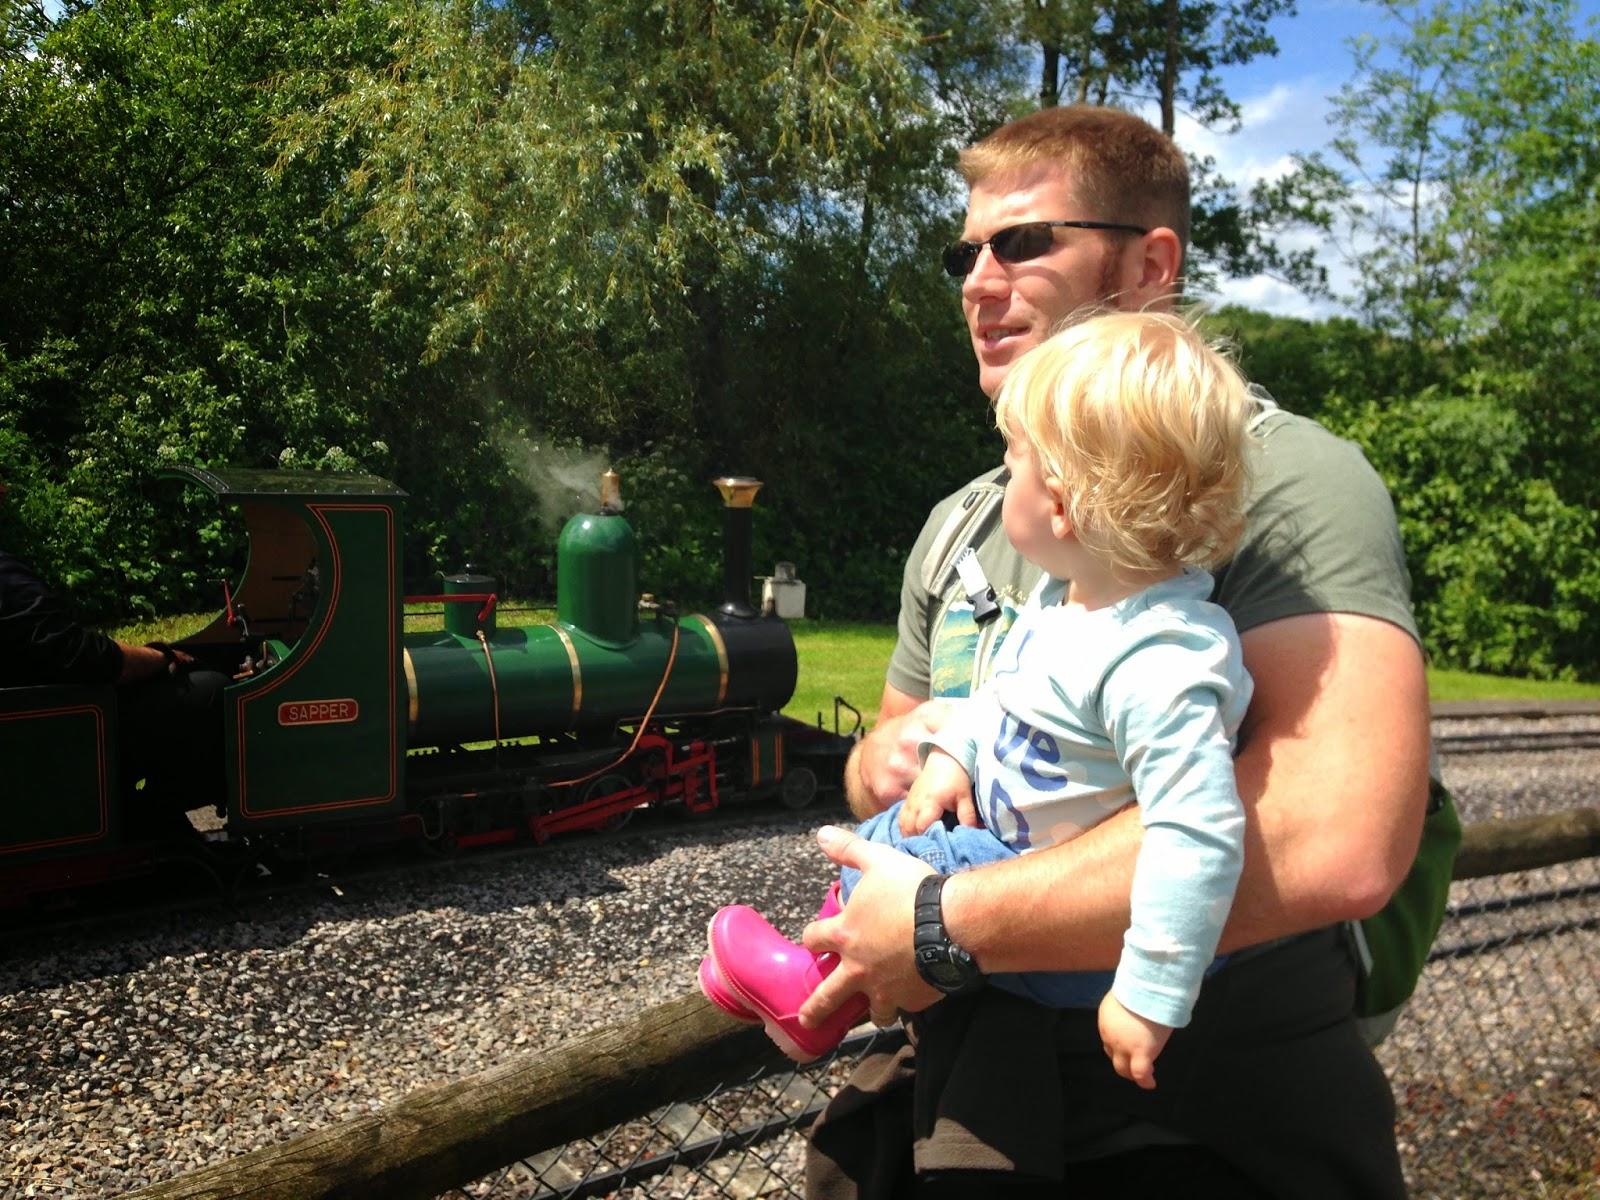 Mr Tin Box and Tin Box Tot spot a train